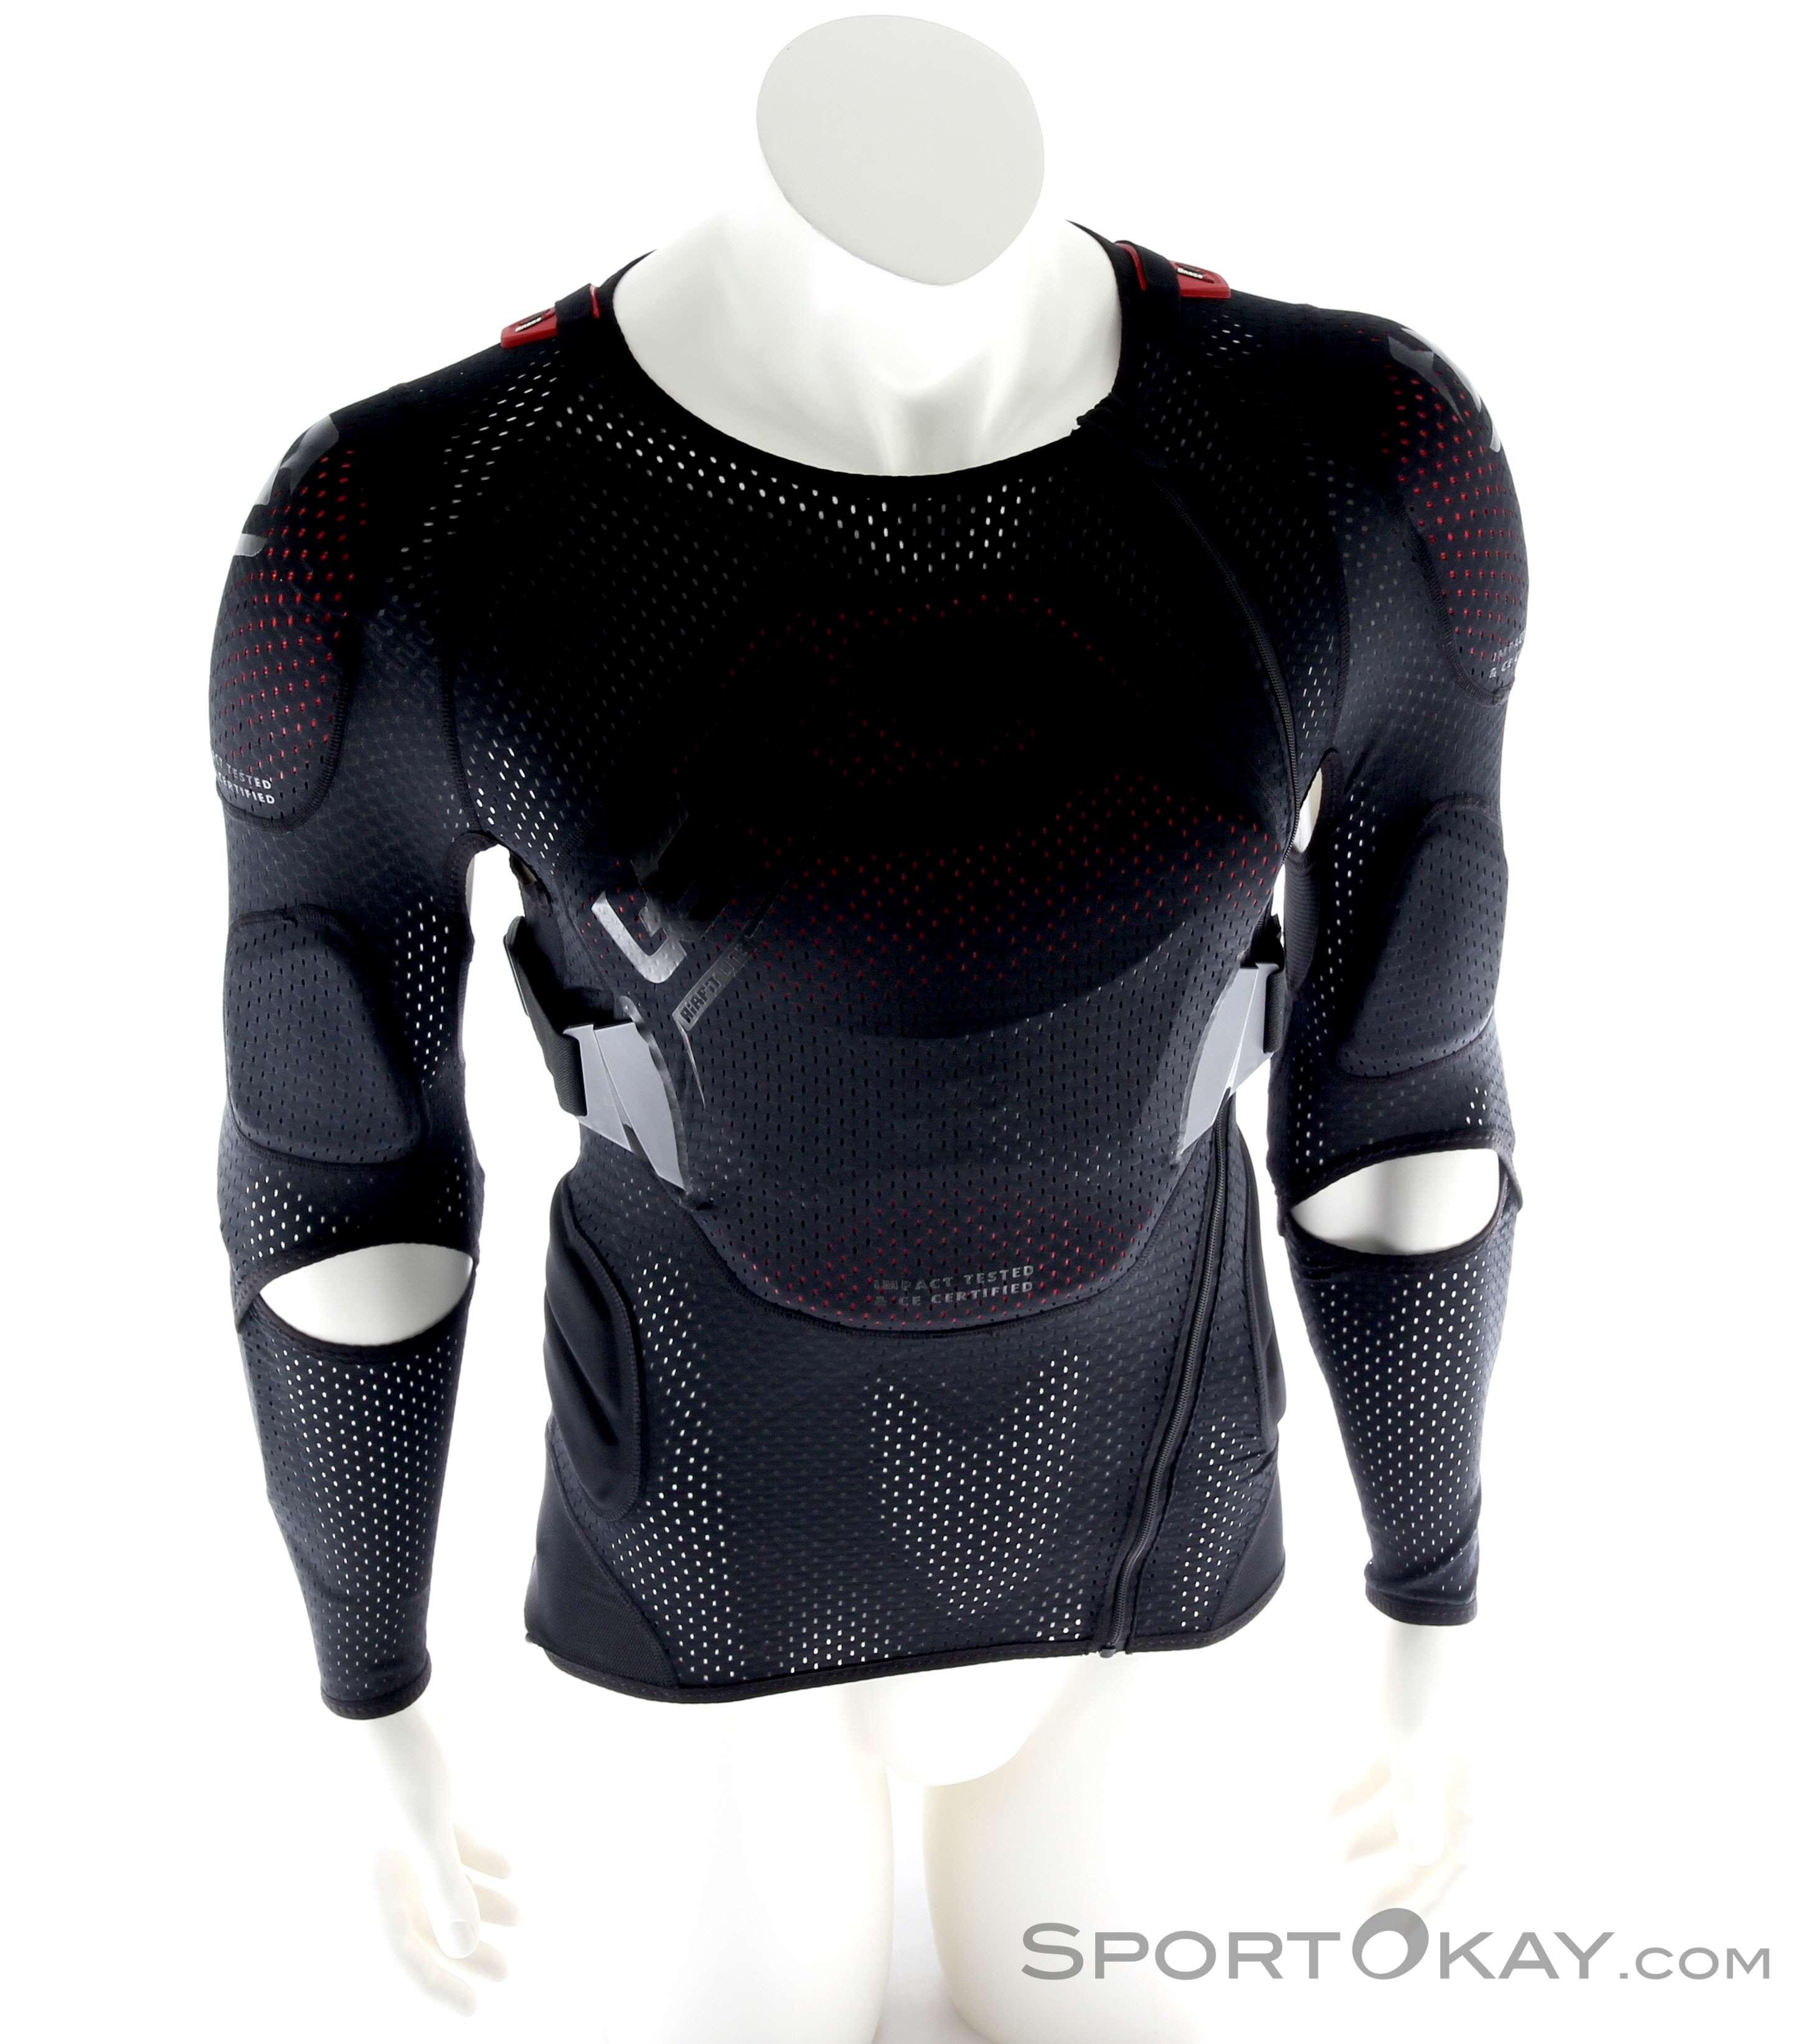 leatt 3df airfit lite nero 2019  Leatt Leatt Body Protector 3DF AirFit Lite Giacca Protettiva